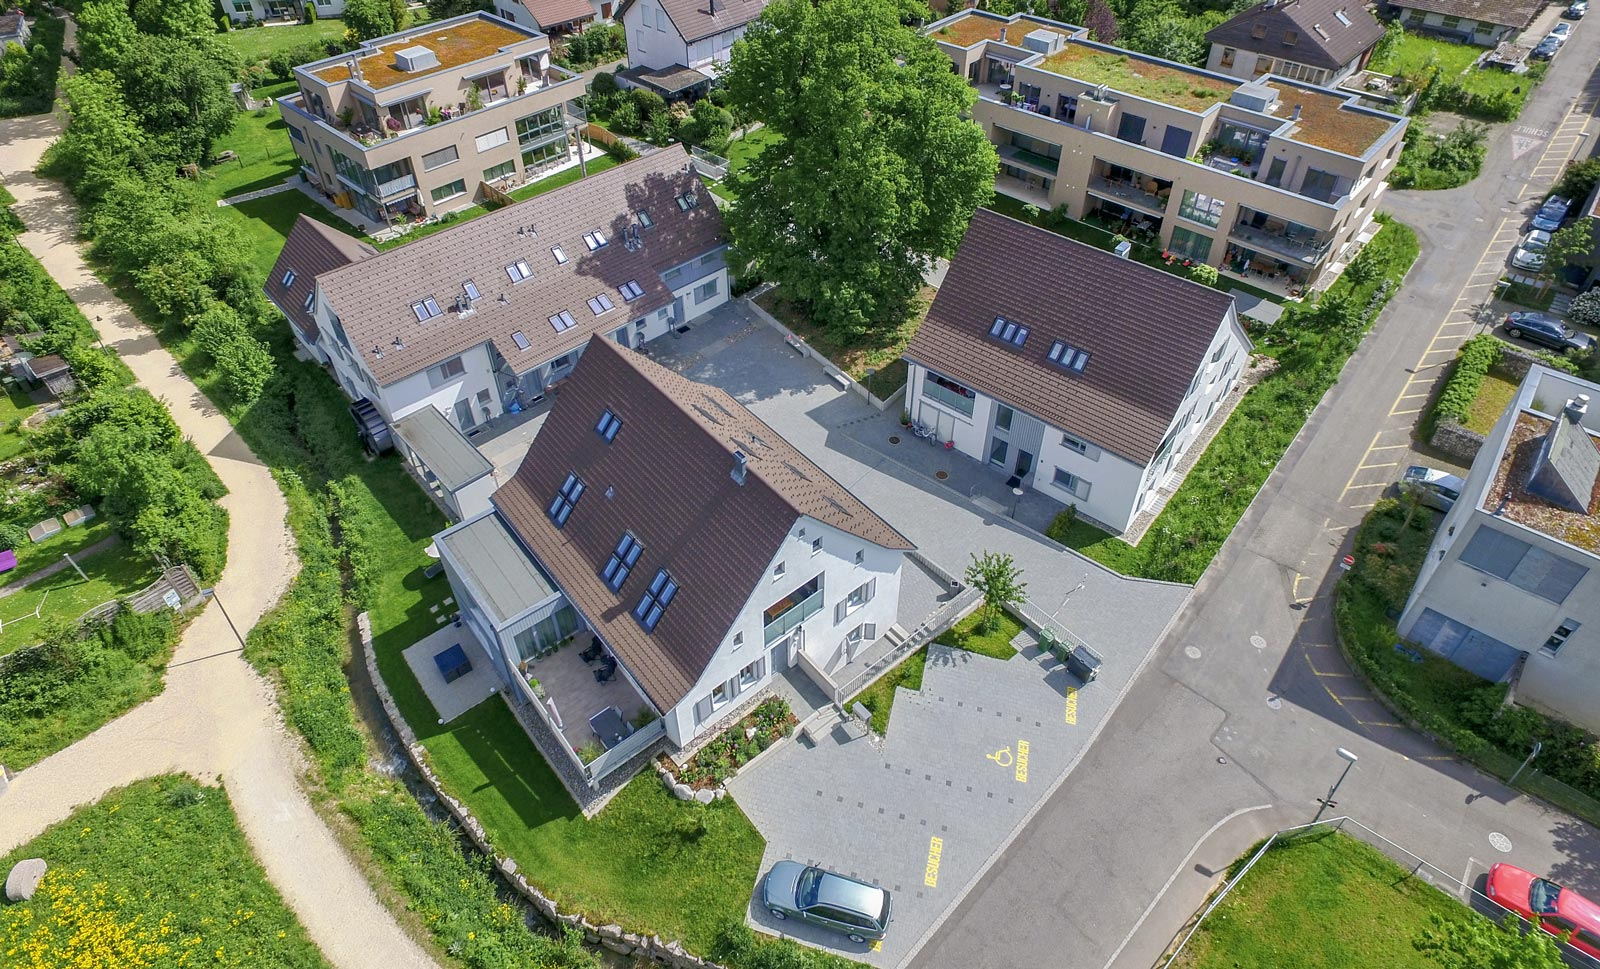 Untere Mühle Therwil – Bräunlin + Kolb